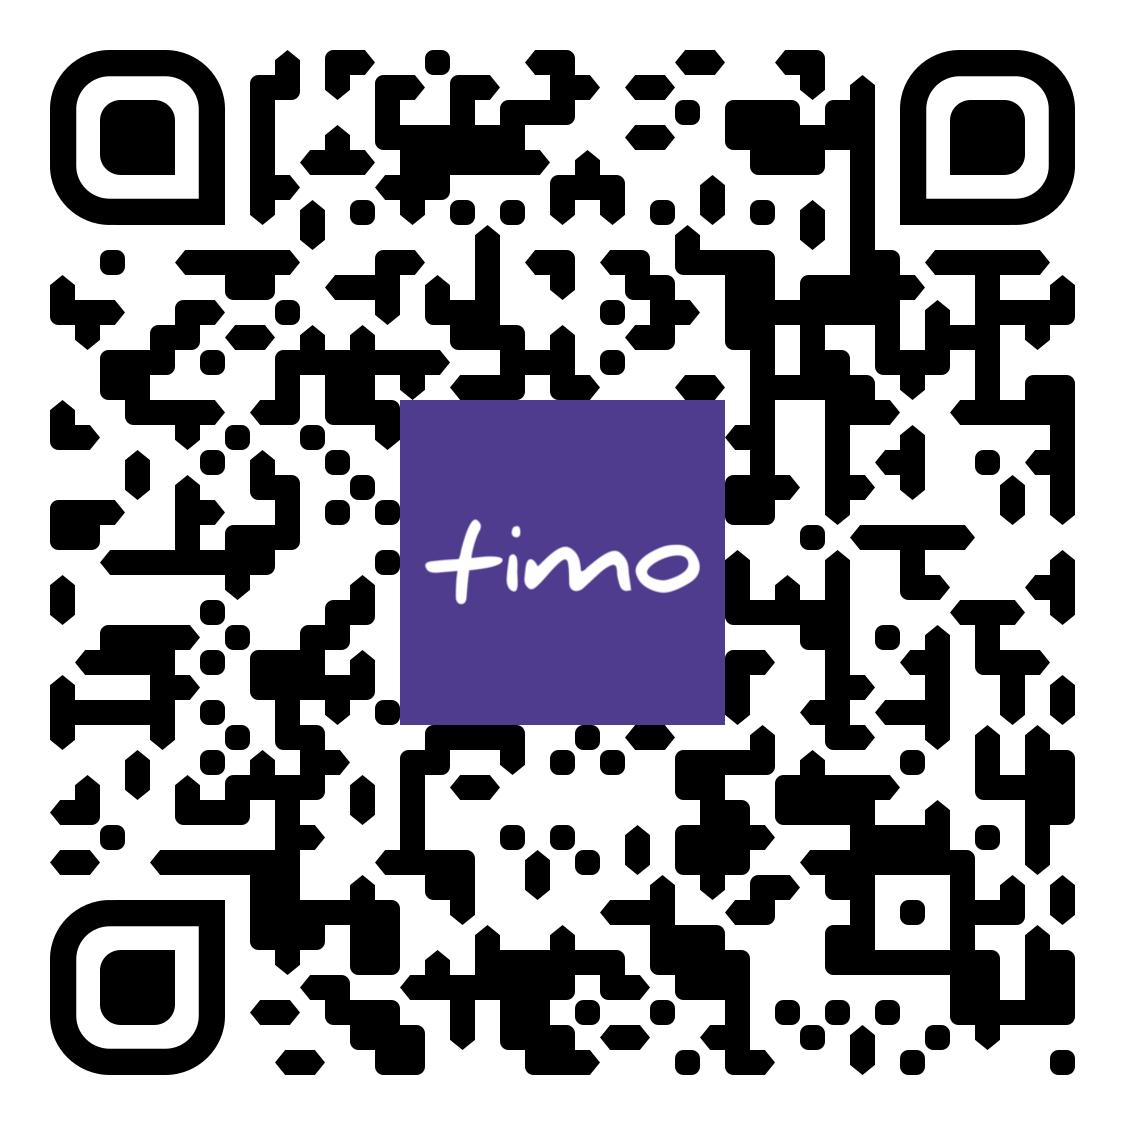 Timo QR code